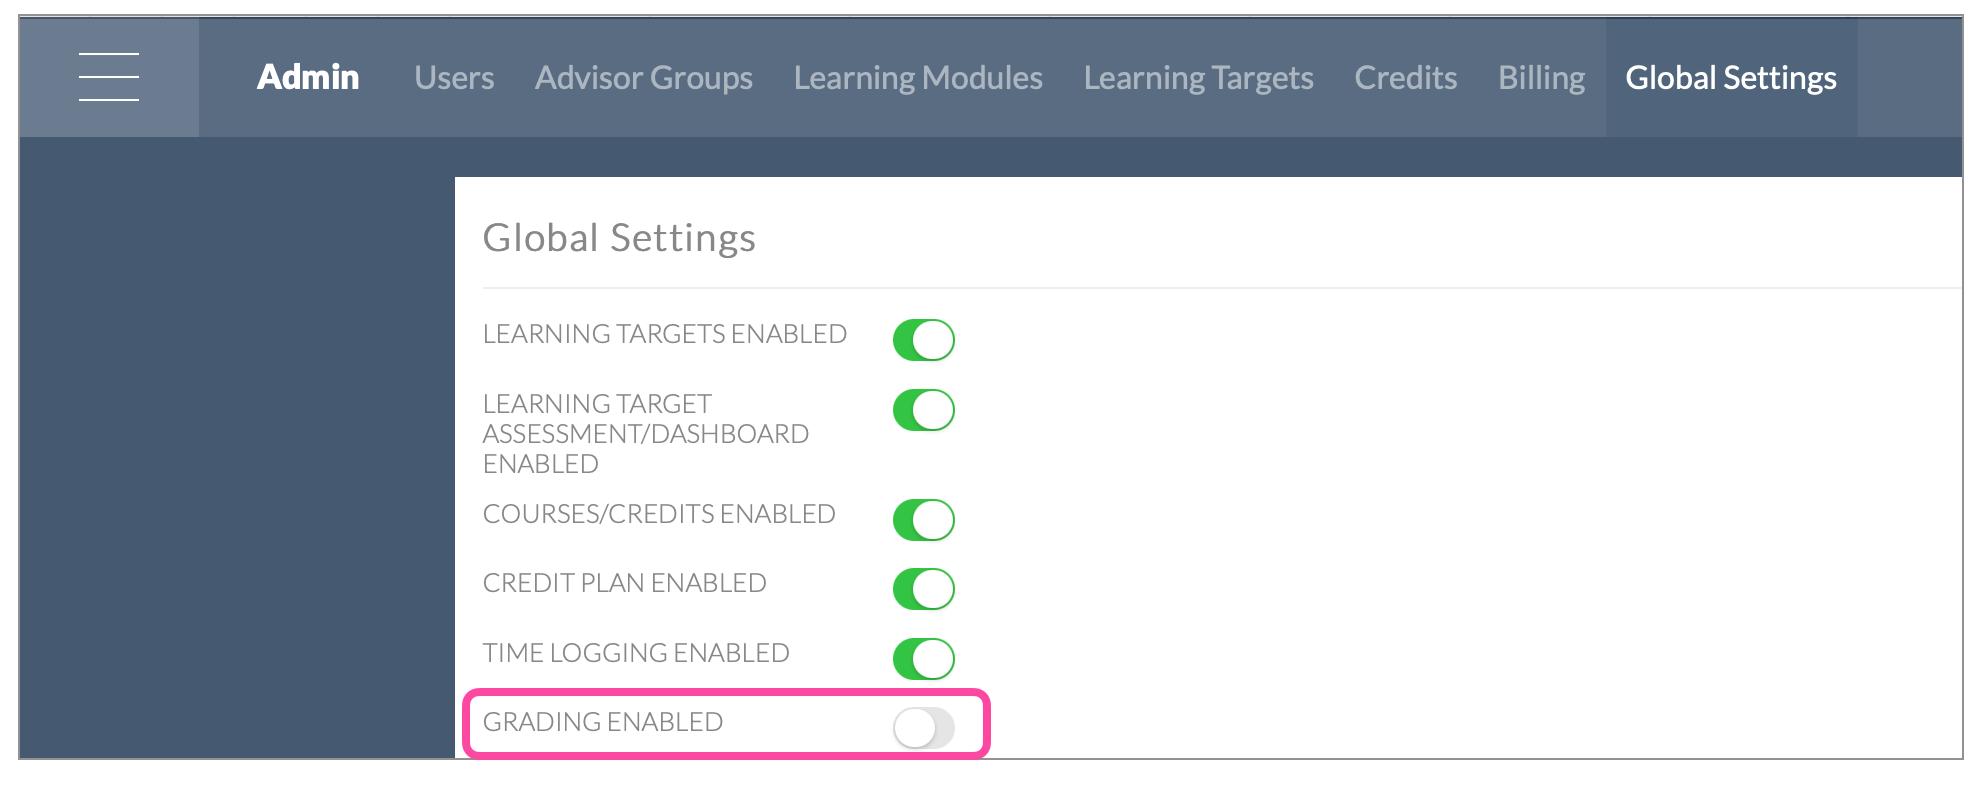 Admin > Global Settings : Grading Enabled option